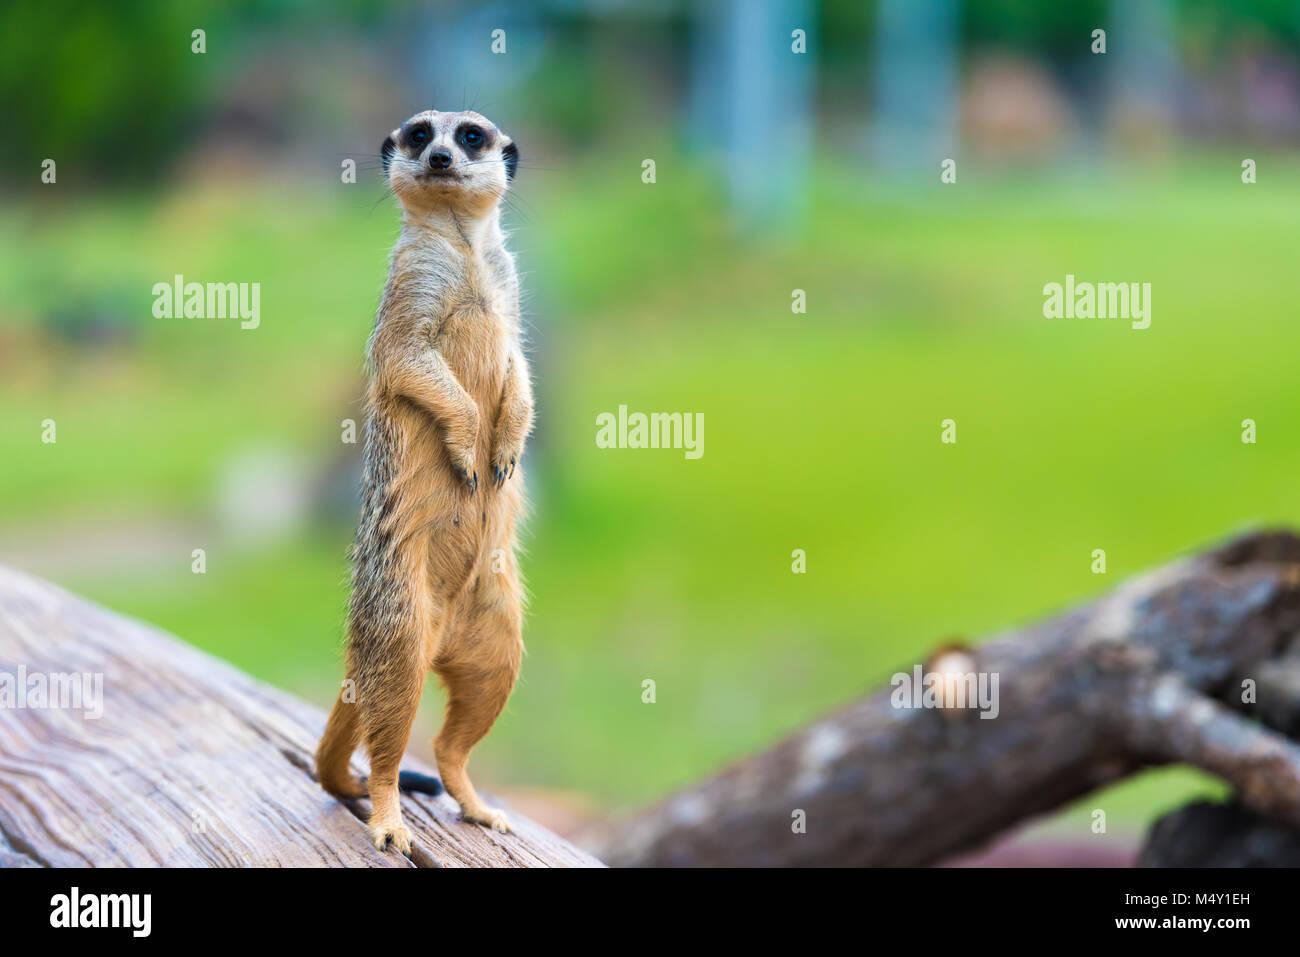 Portrait of Meerkat Suricata suricatta, African native animal, small carnivore belonging to the mongoose family - Stock Image